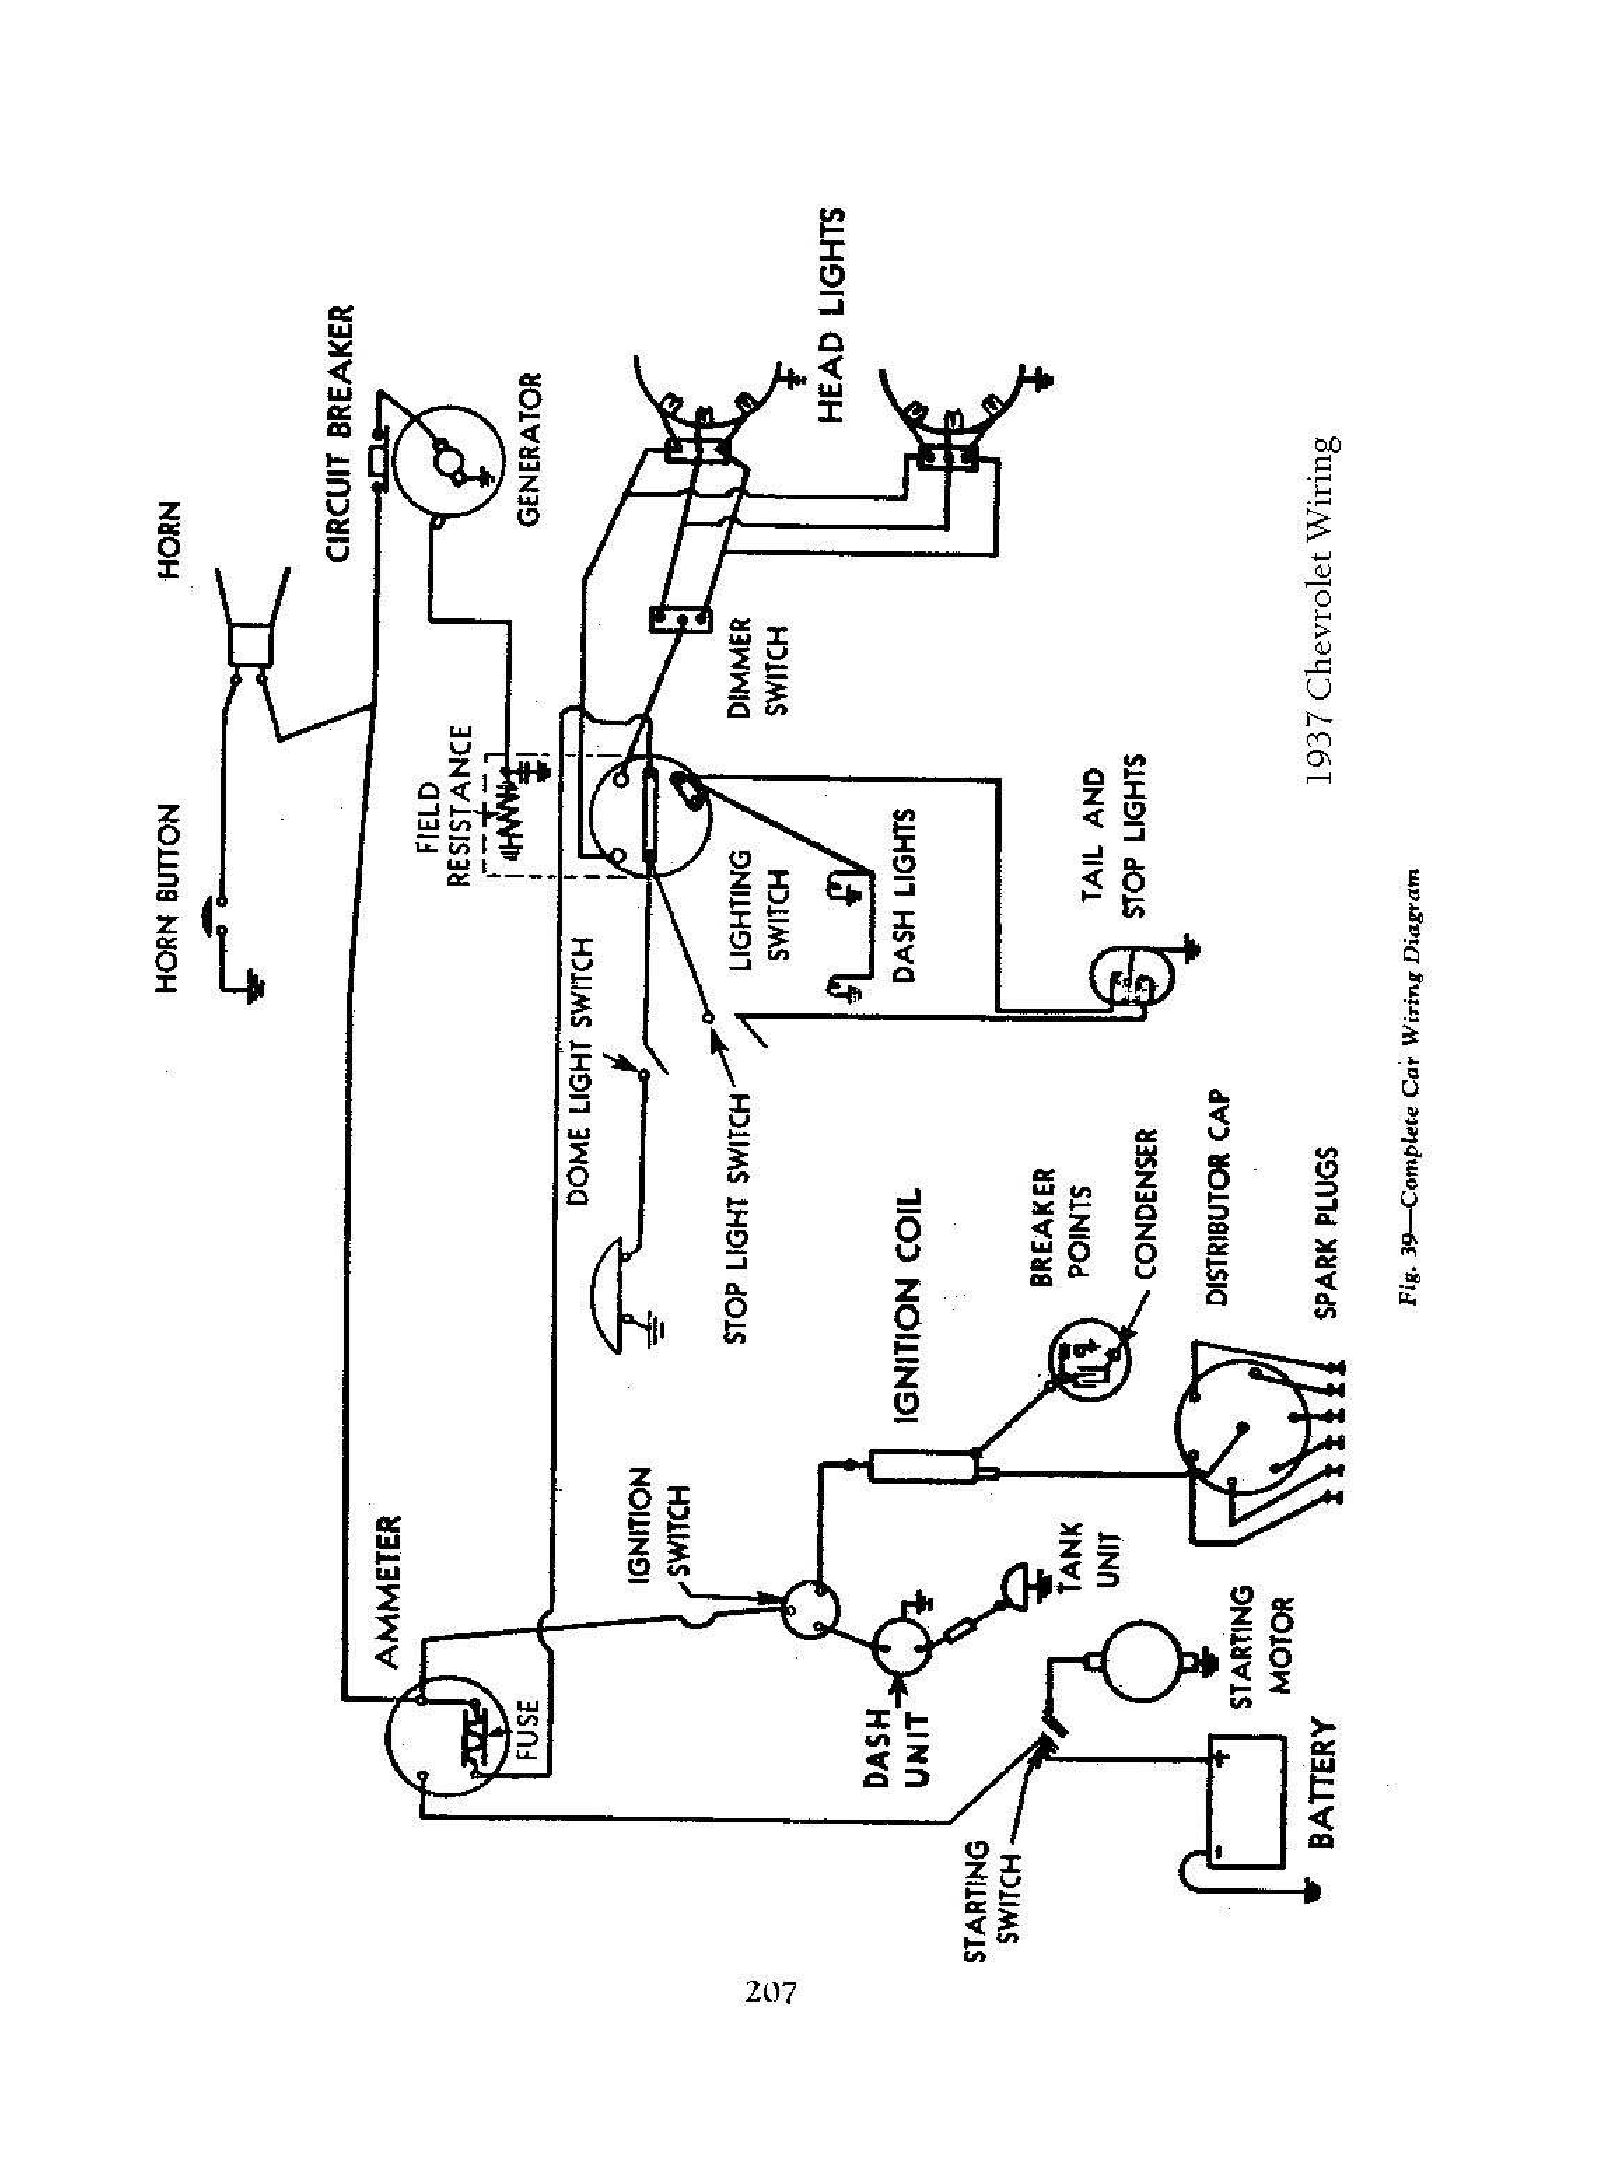 1947 chevy wiring diagram